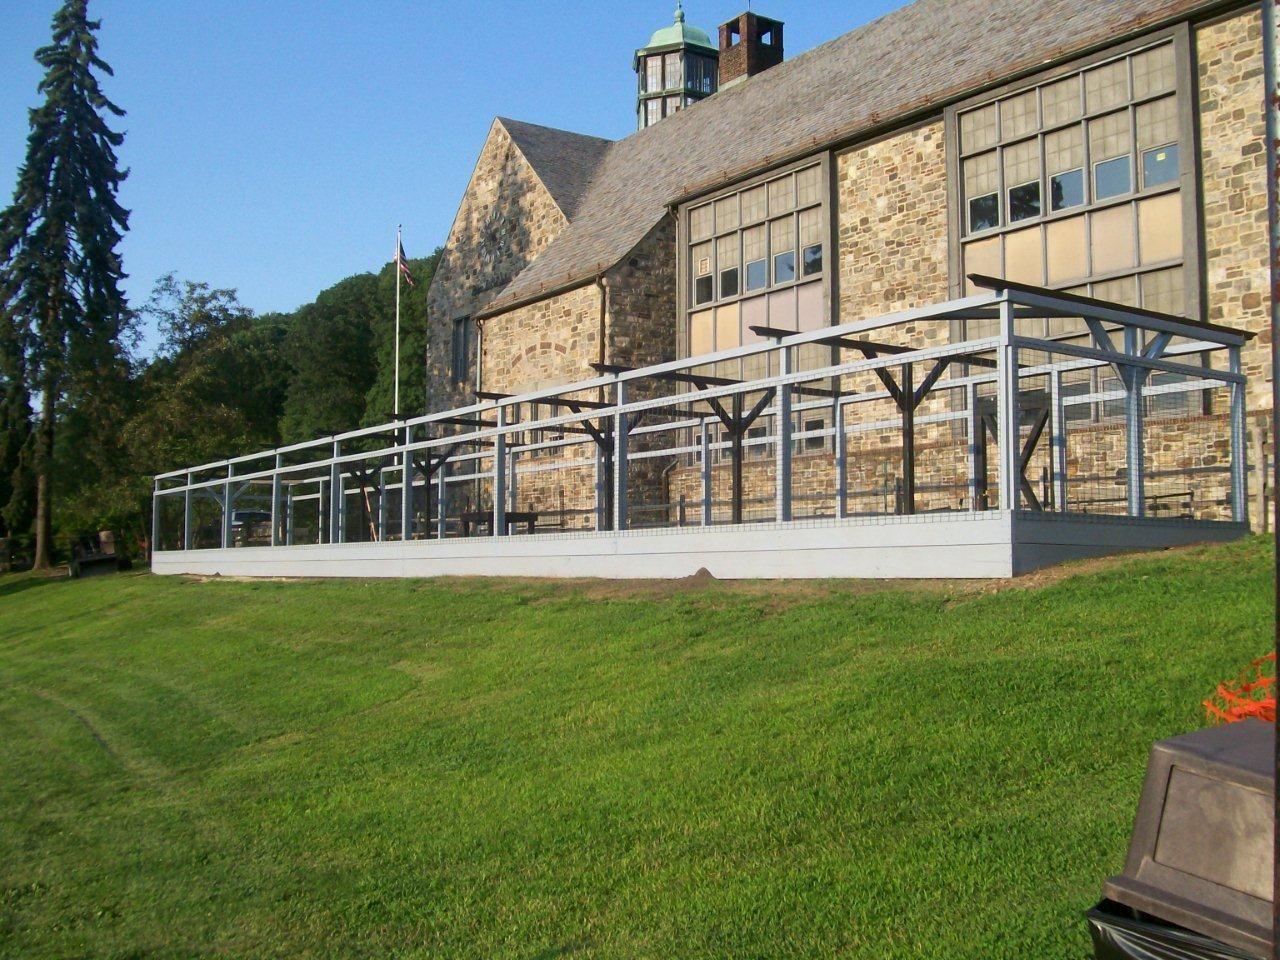 School garden System in Chappaqua NY Robert E Bell school ...